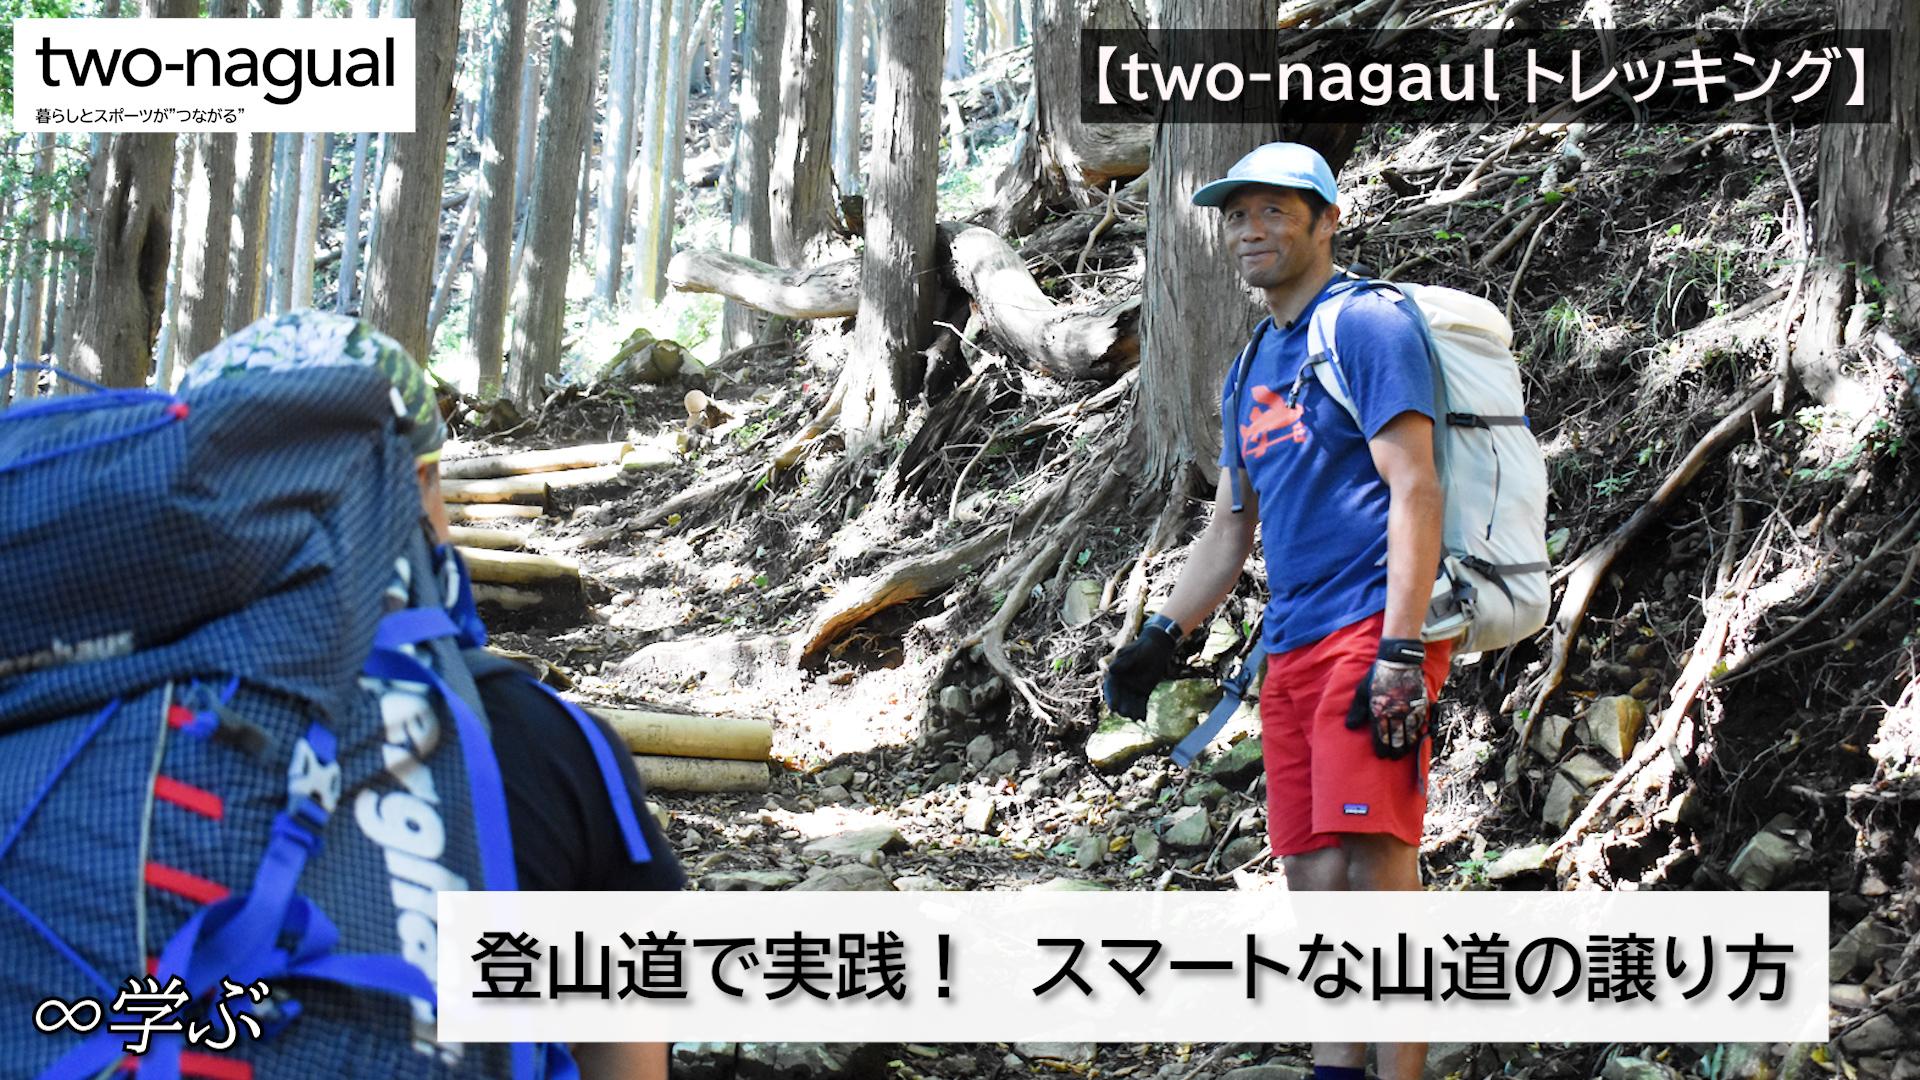 <small>【two-nagual トレッキング】</small><br />登山道で実践!<br/>スマートな山道の譲り方